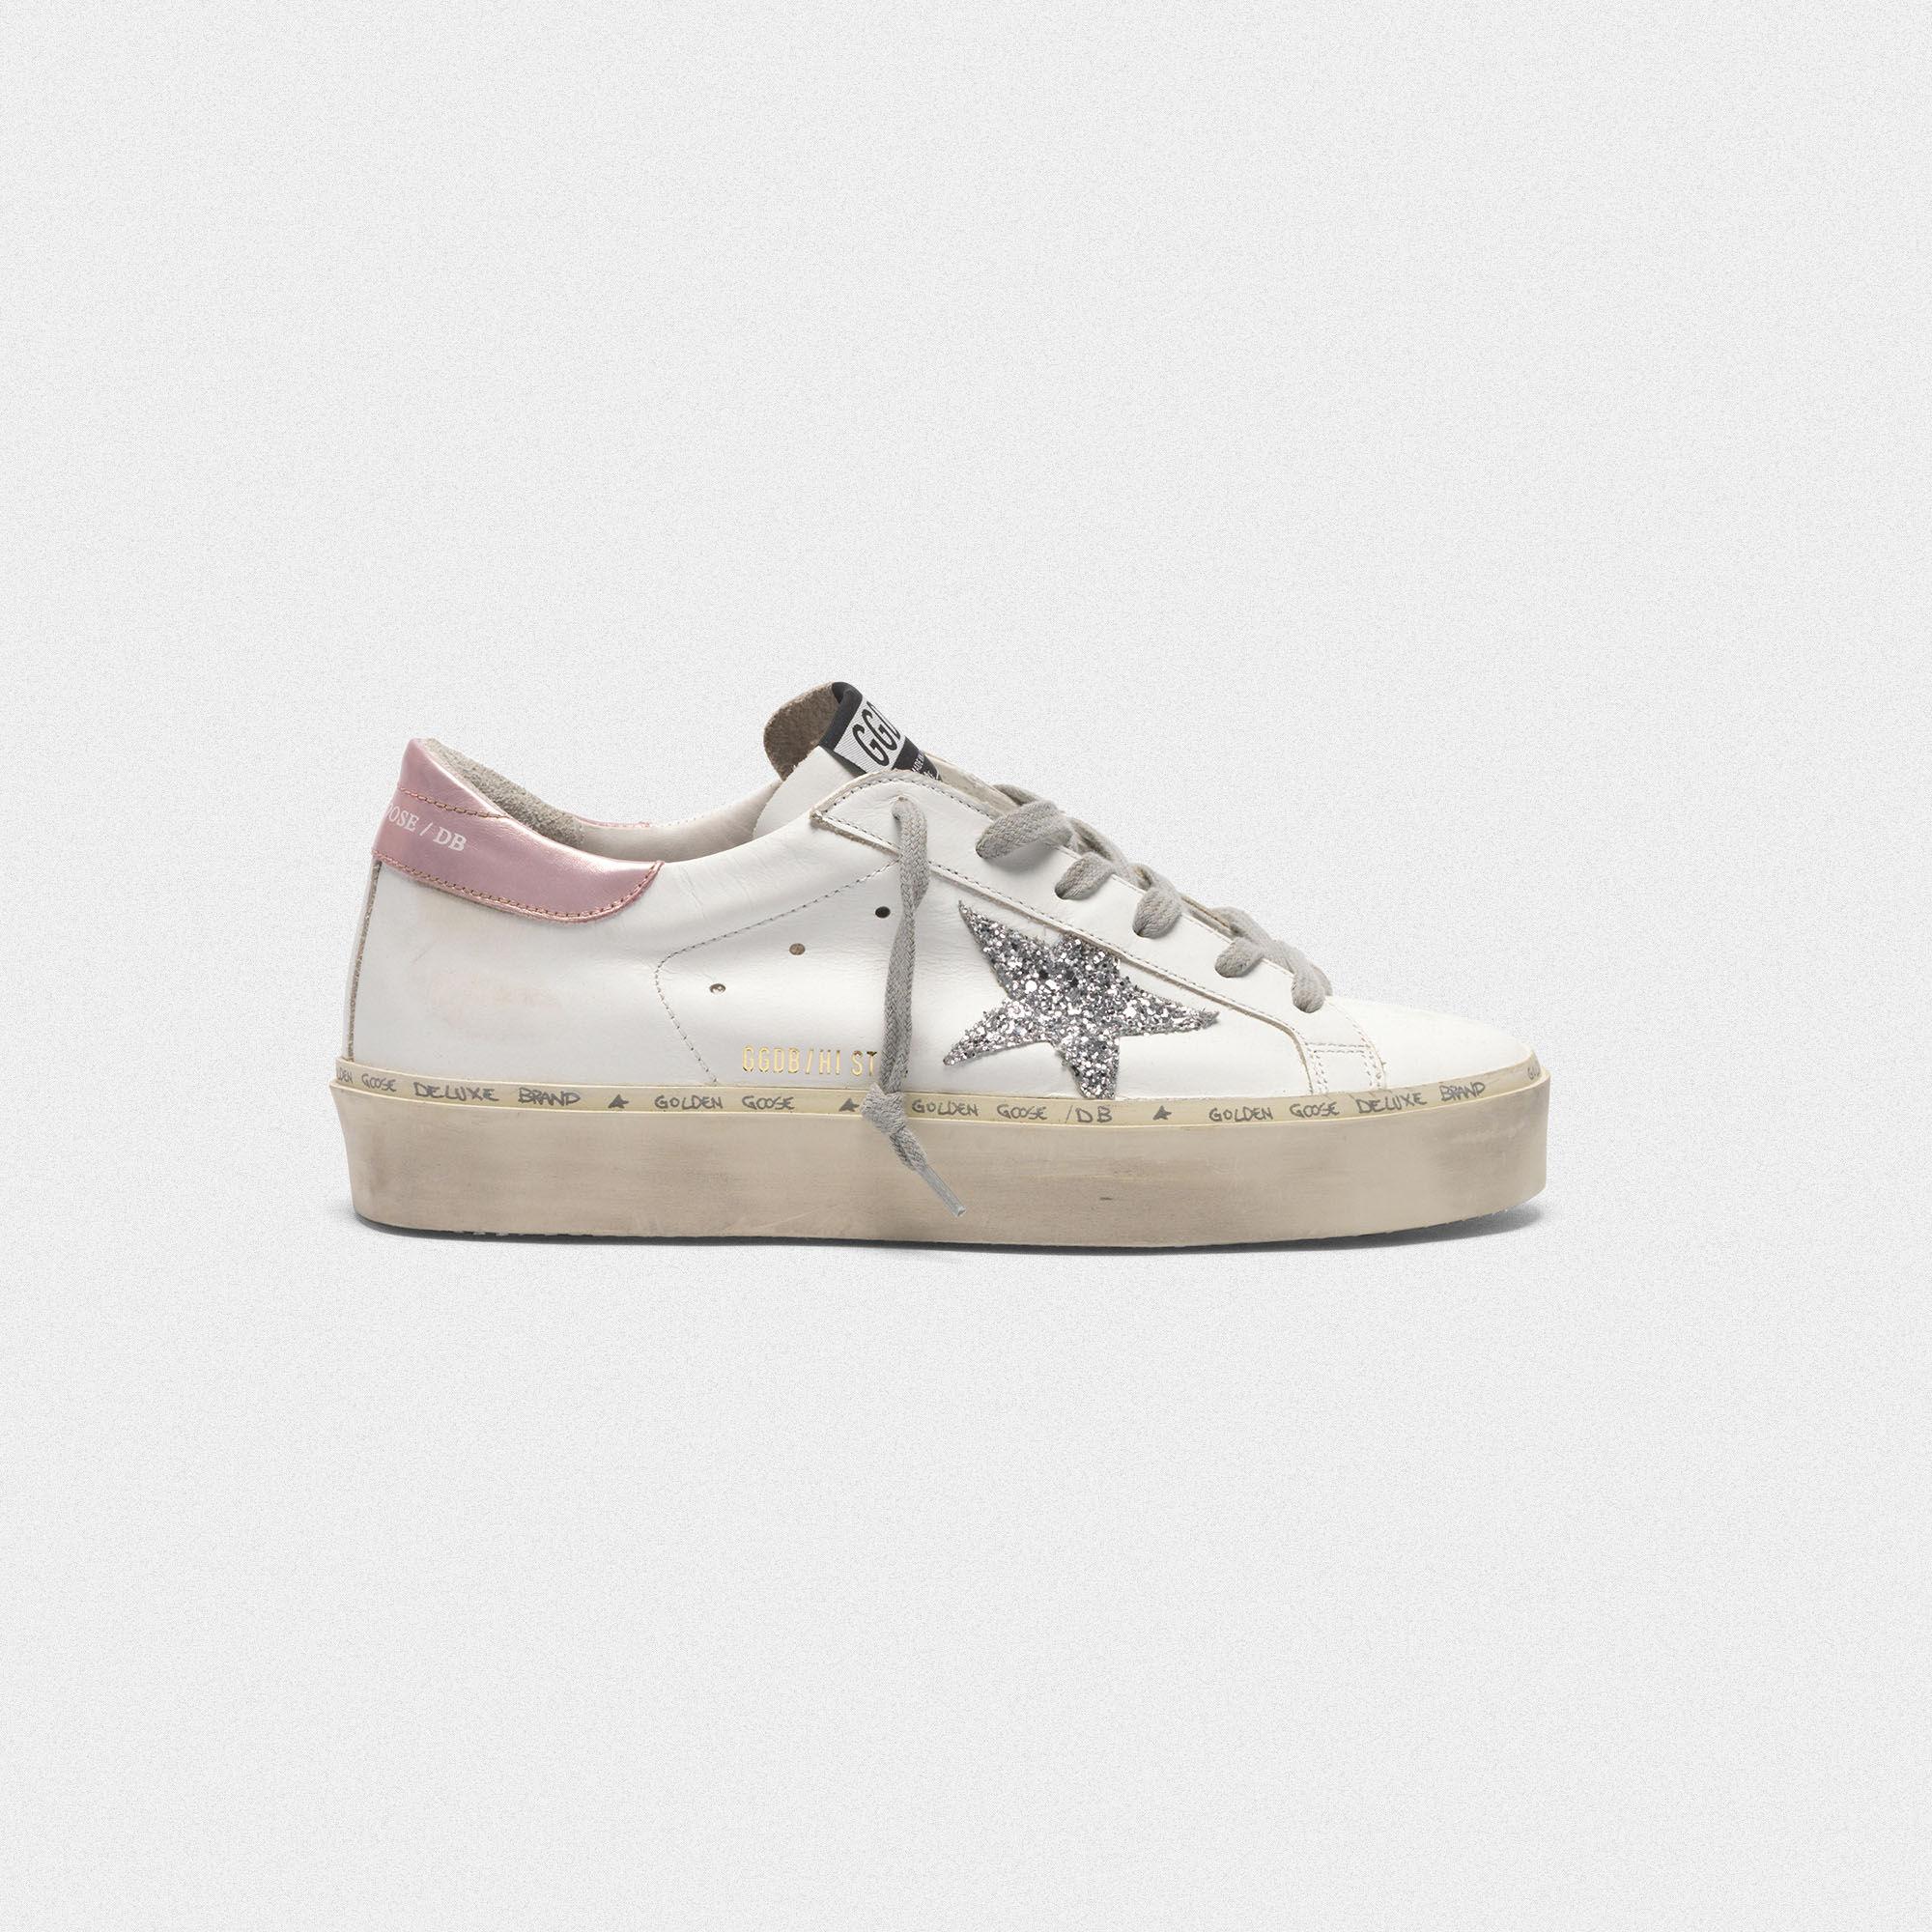 Golden Goose Hi Star Glitter Platform Sneaker in 2019